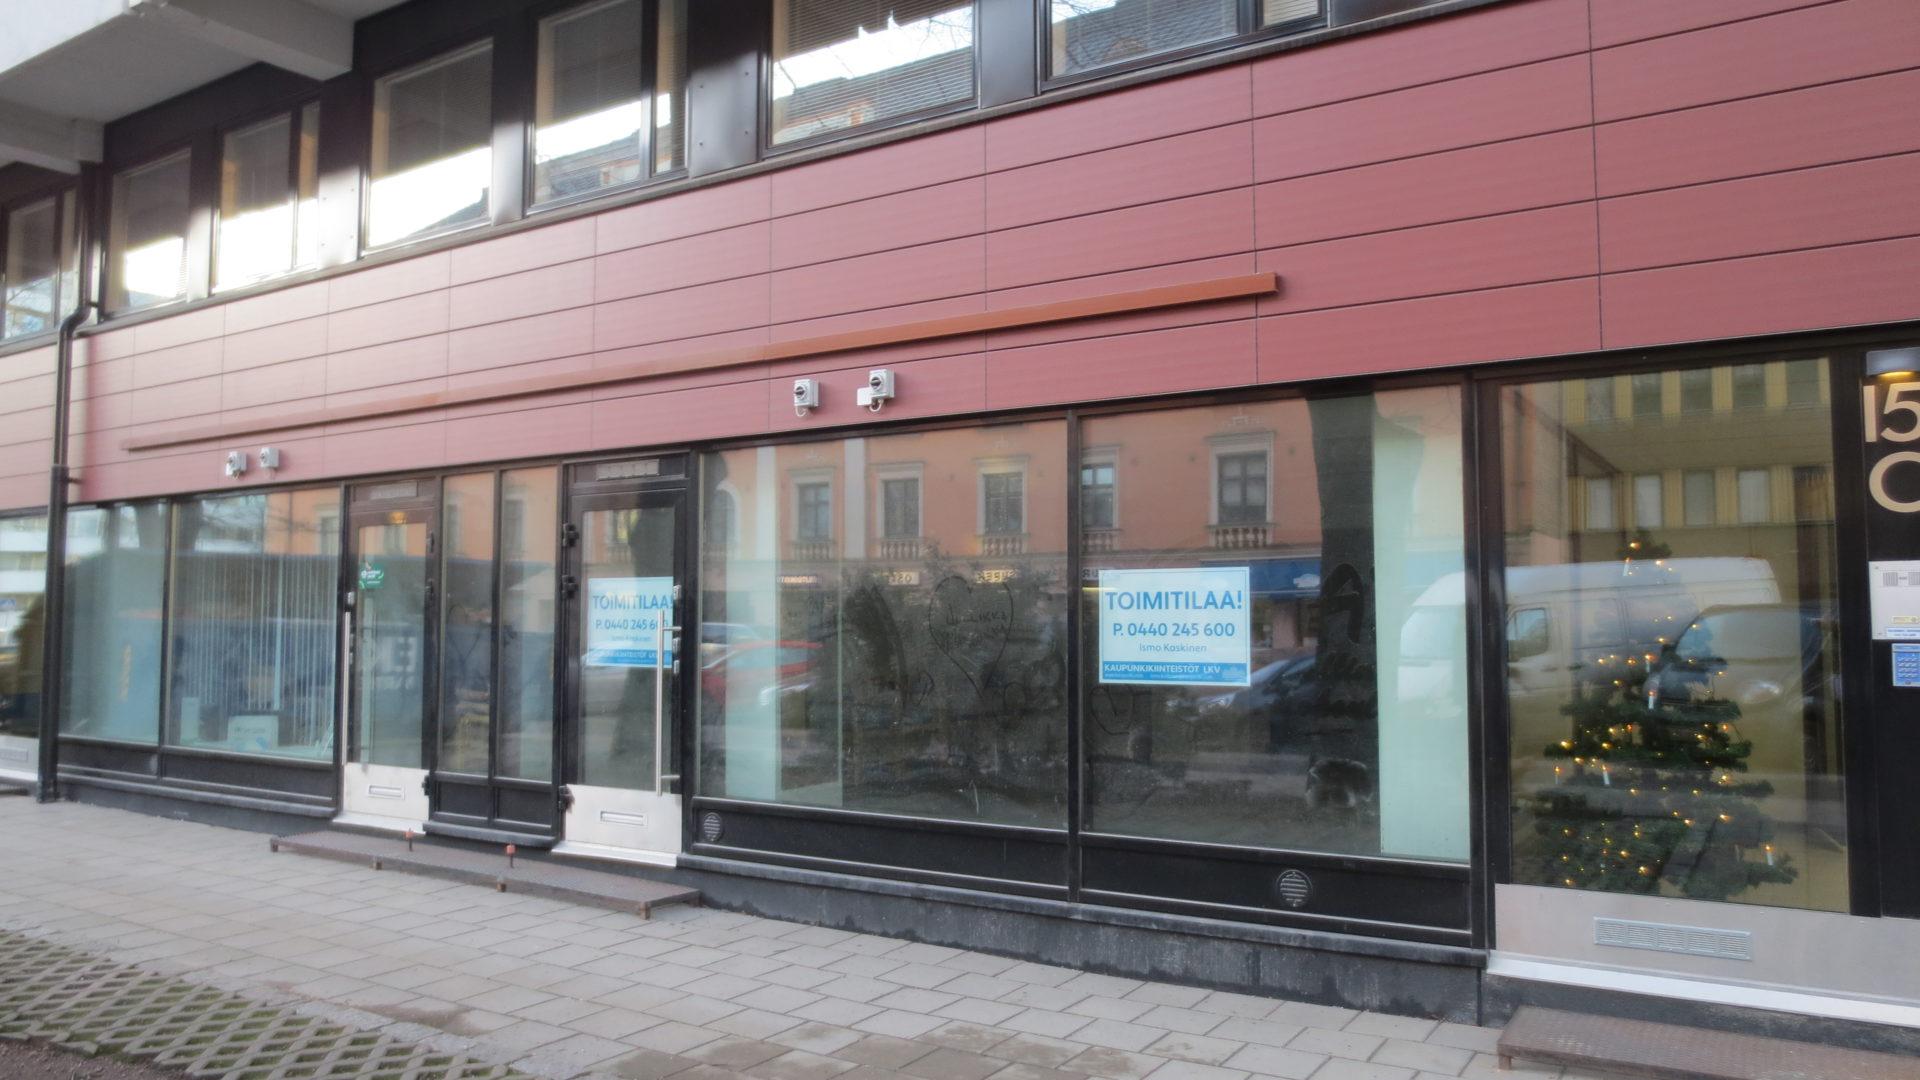 Puutarhakatu 15 Turku